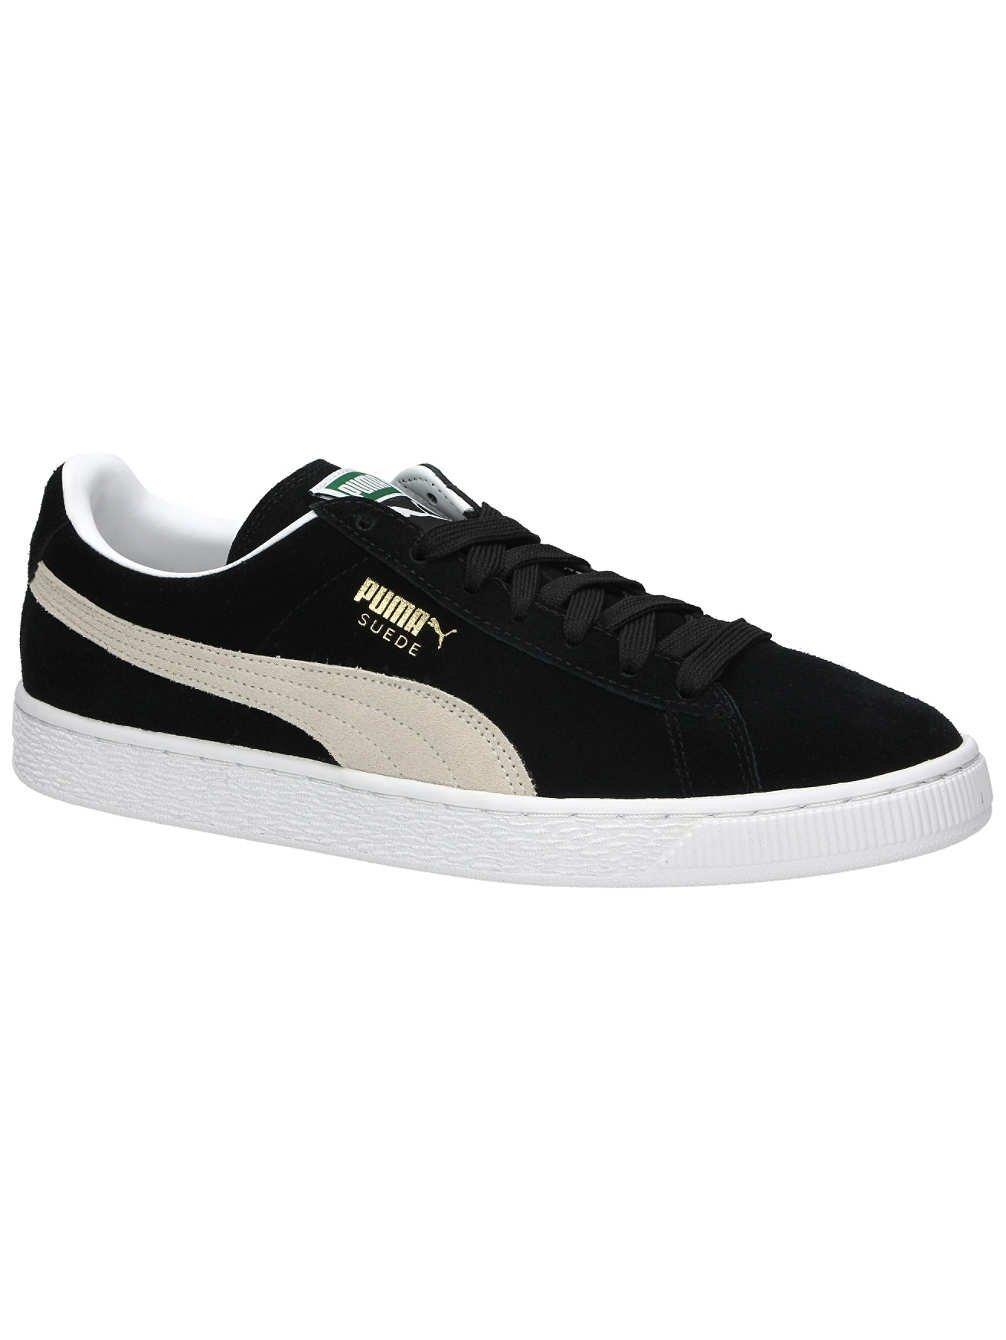 Puma Suede Classic+, Zapatillas Unisex Adulto 9|Negro